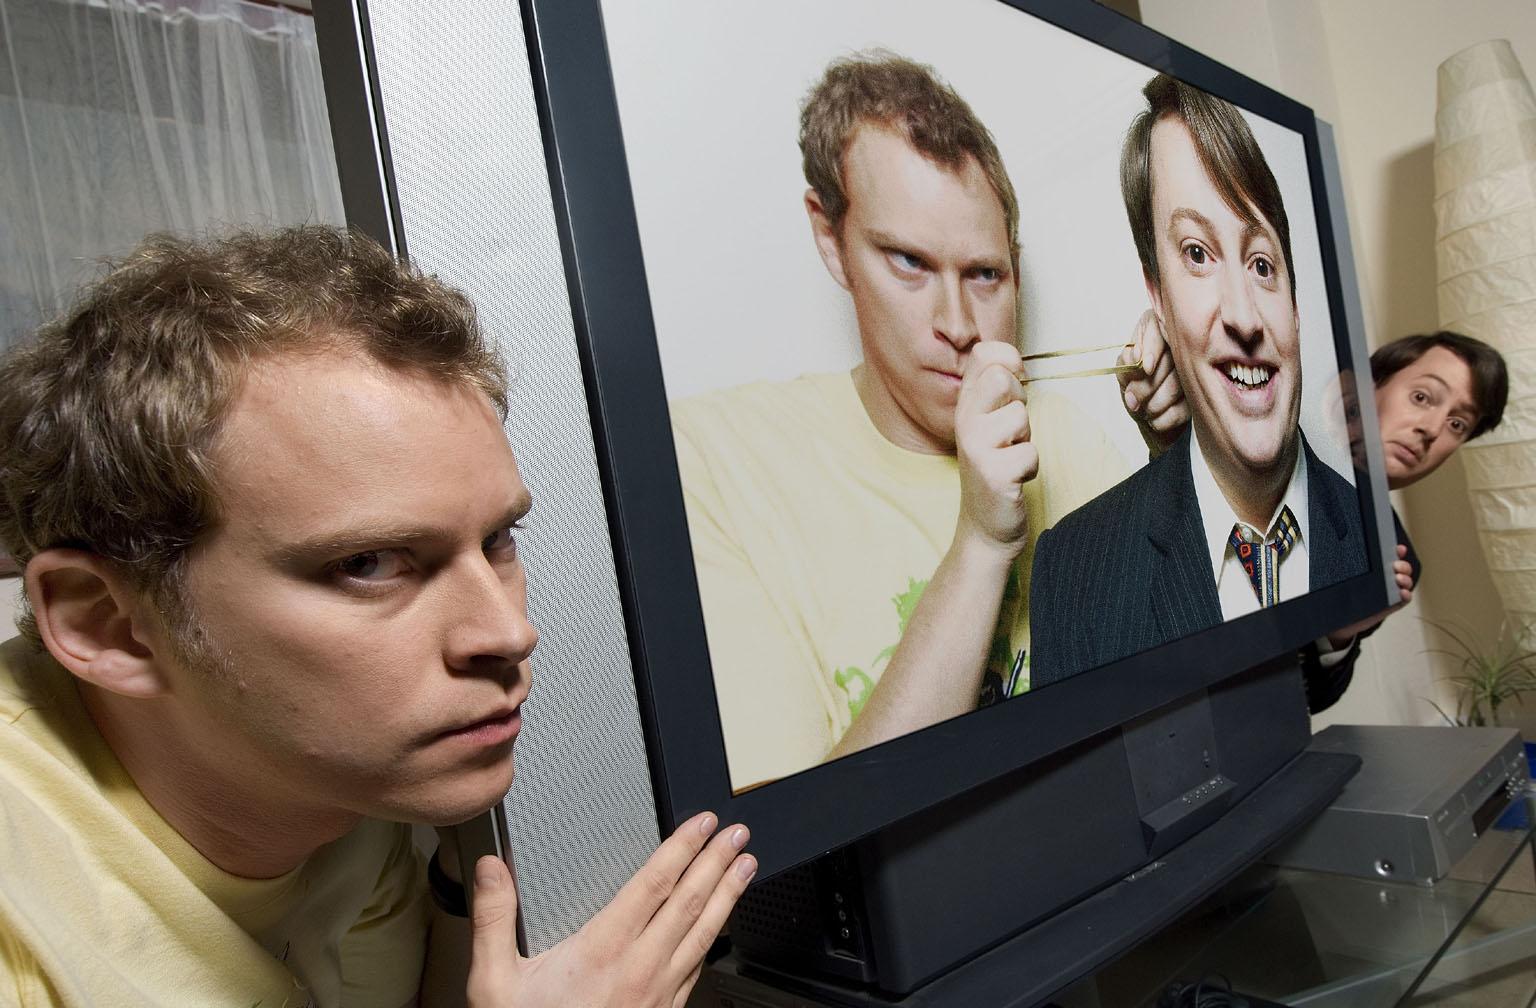 kancelář michael scott online dating